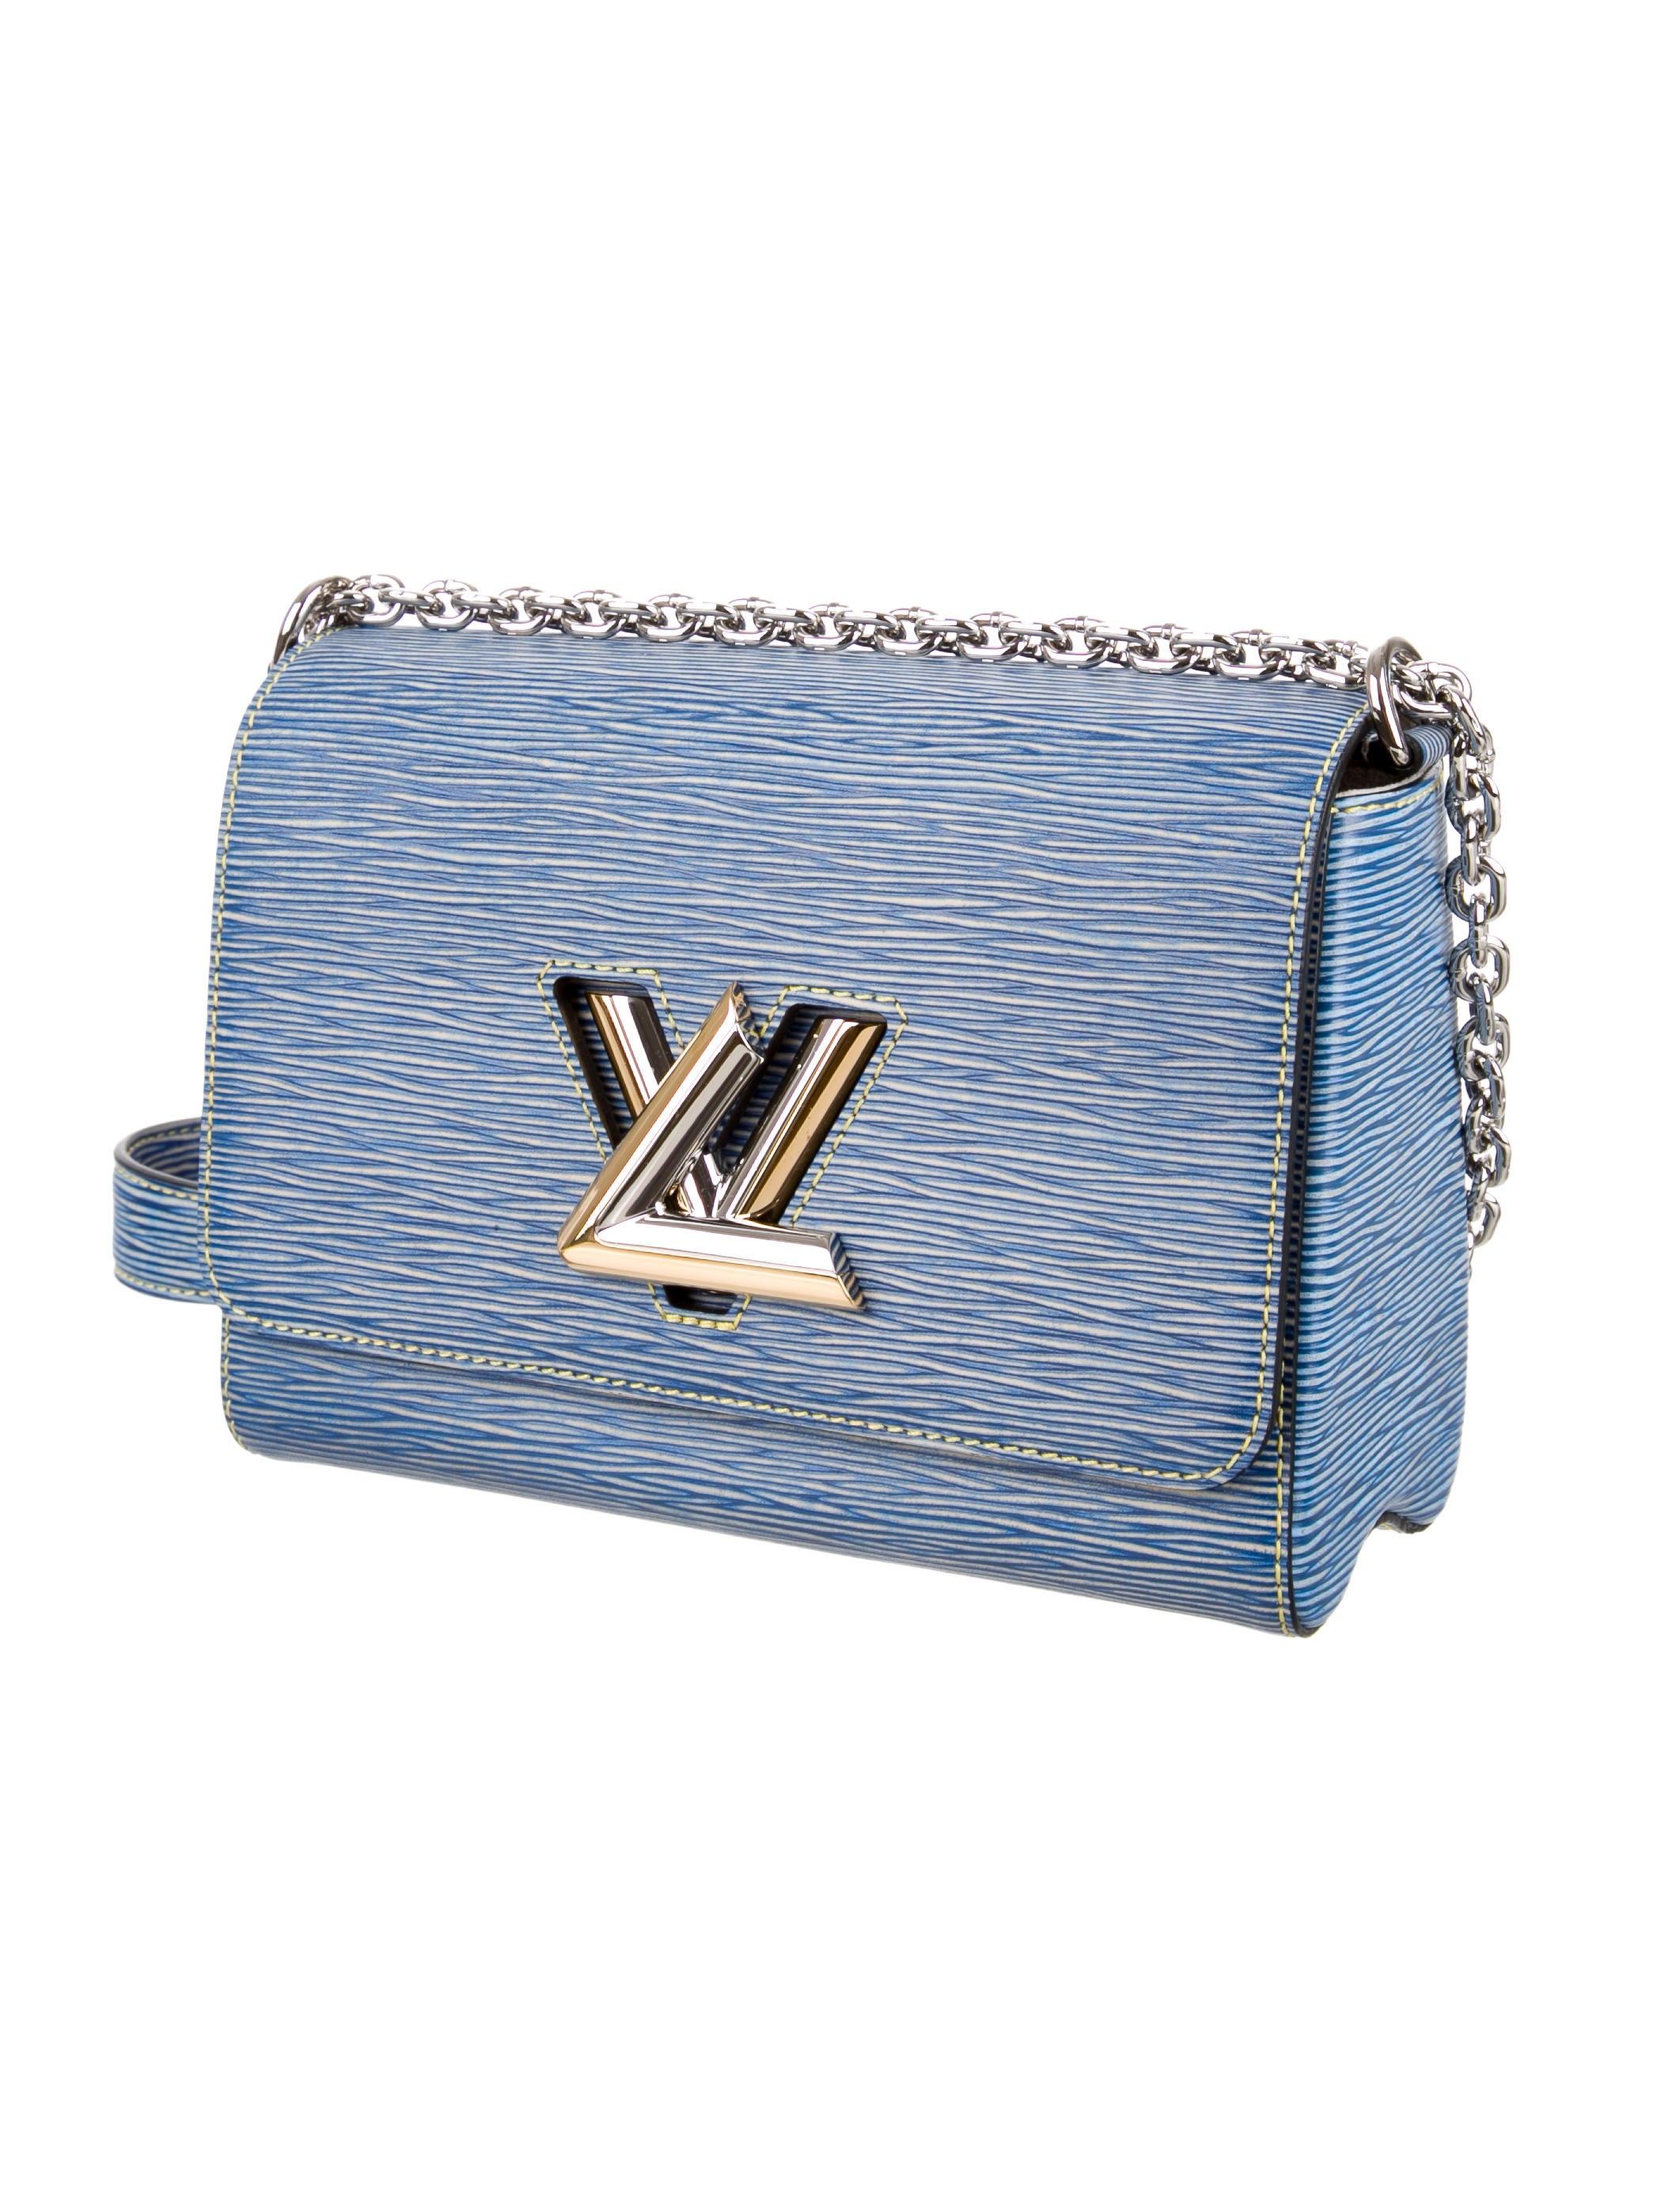 fb2435940e85 Louis Vuitton Epi Twist Mm Bag